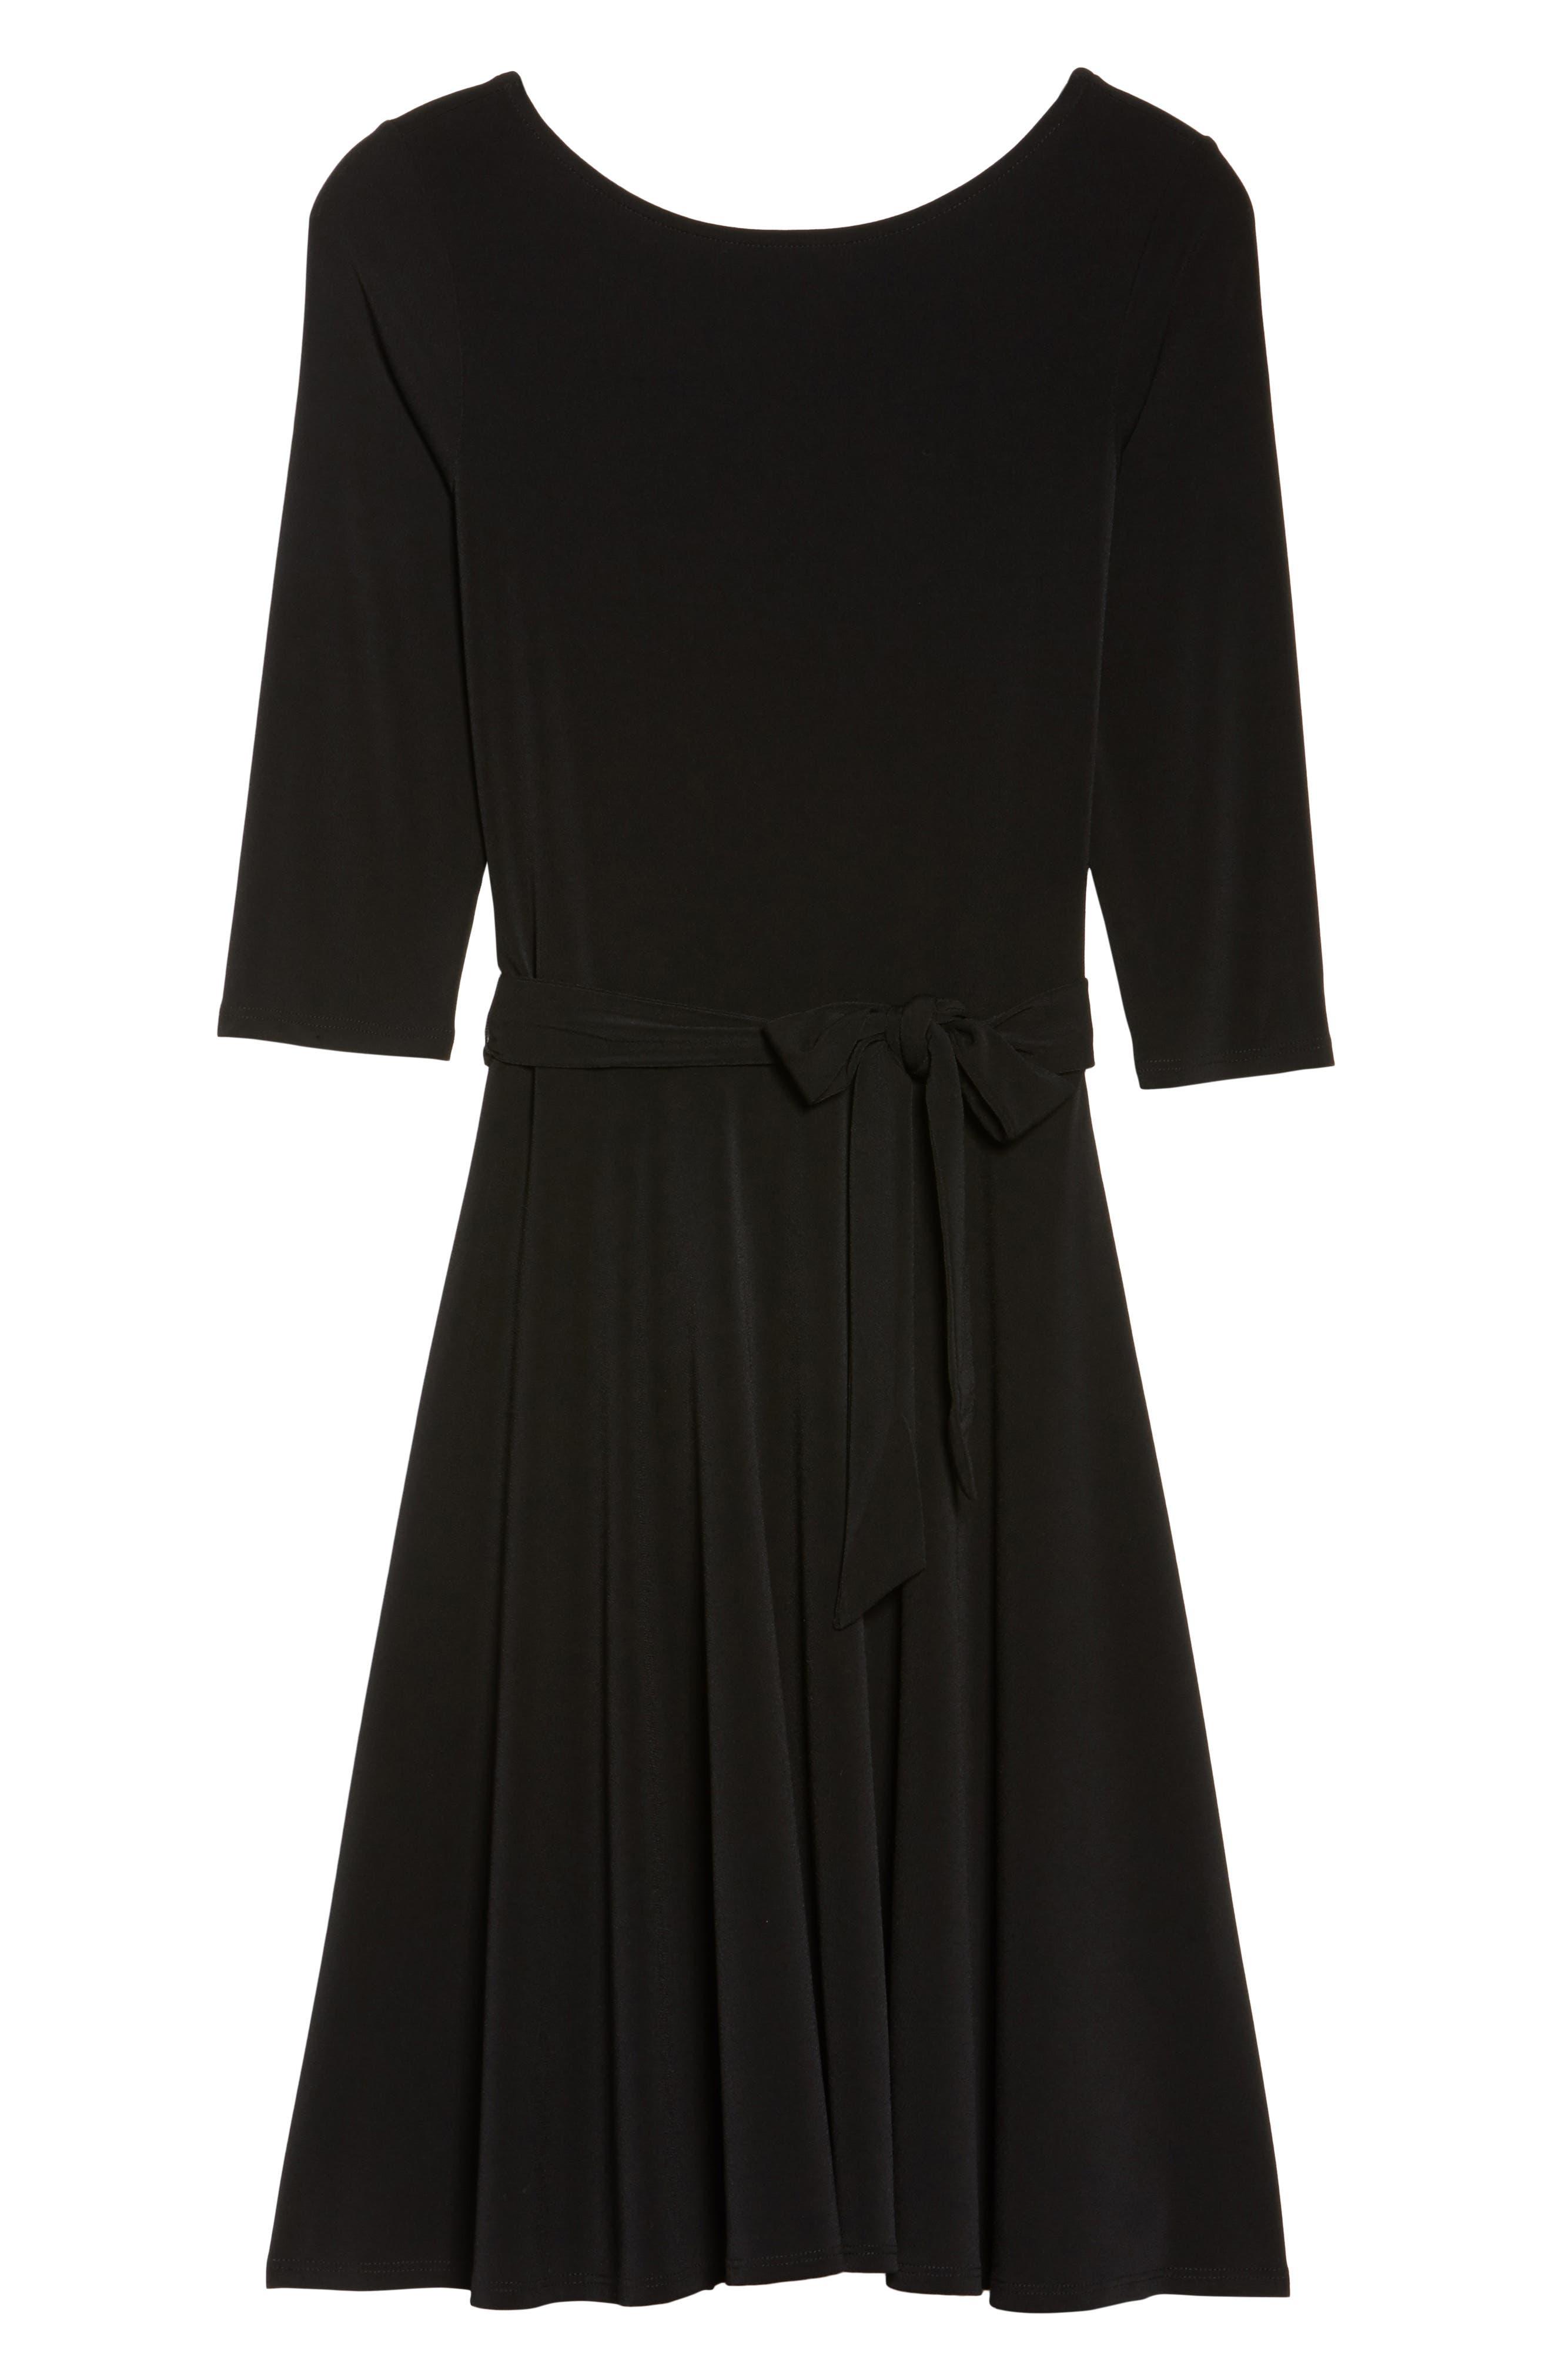 Belted Print Jersey A-Line Dress,                             Alternate thumbnail 7, color,                             Black Crepe